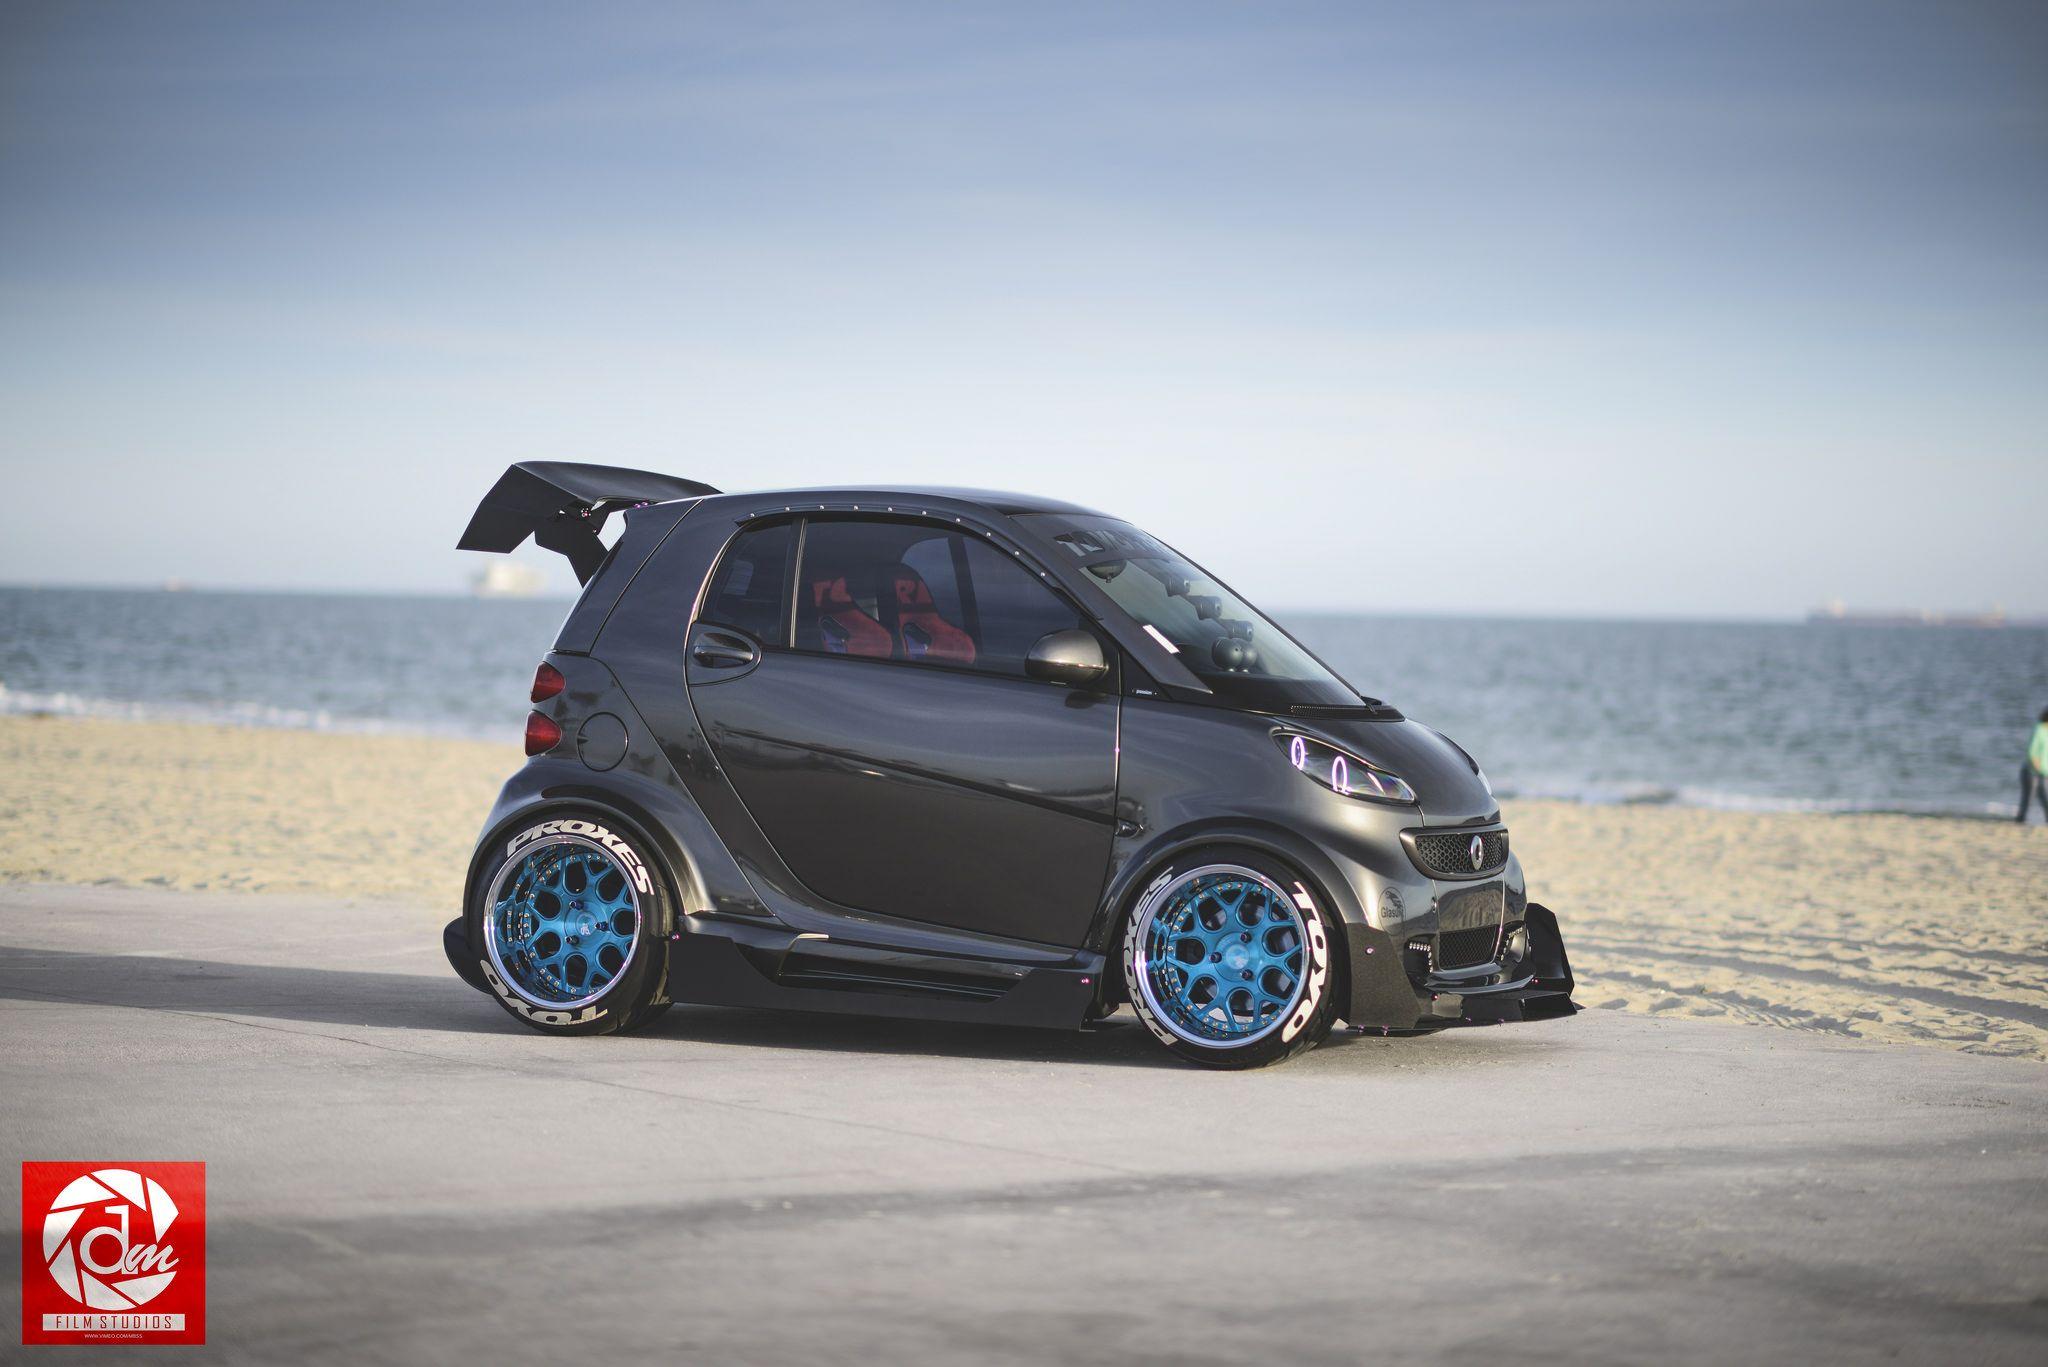 The Coolest Smart Car Smart Car Smart Fortwo Benz Smart